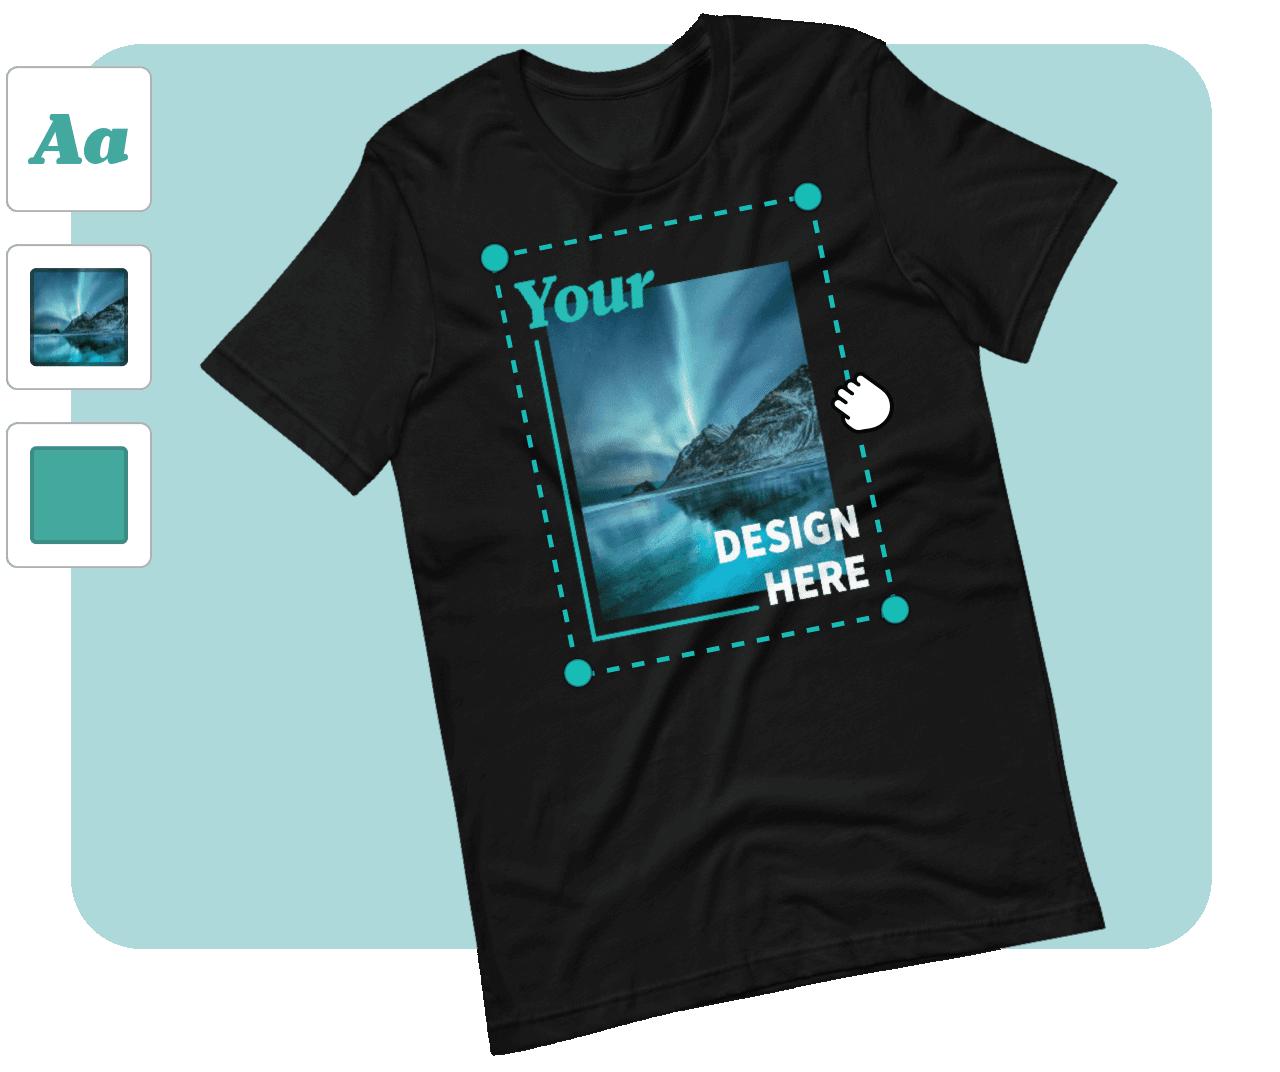 t-shirt mockup generator online